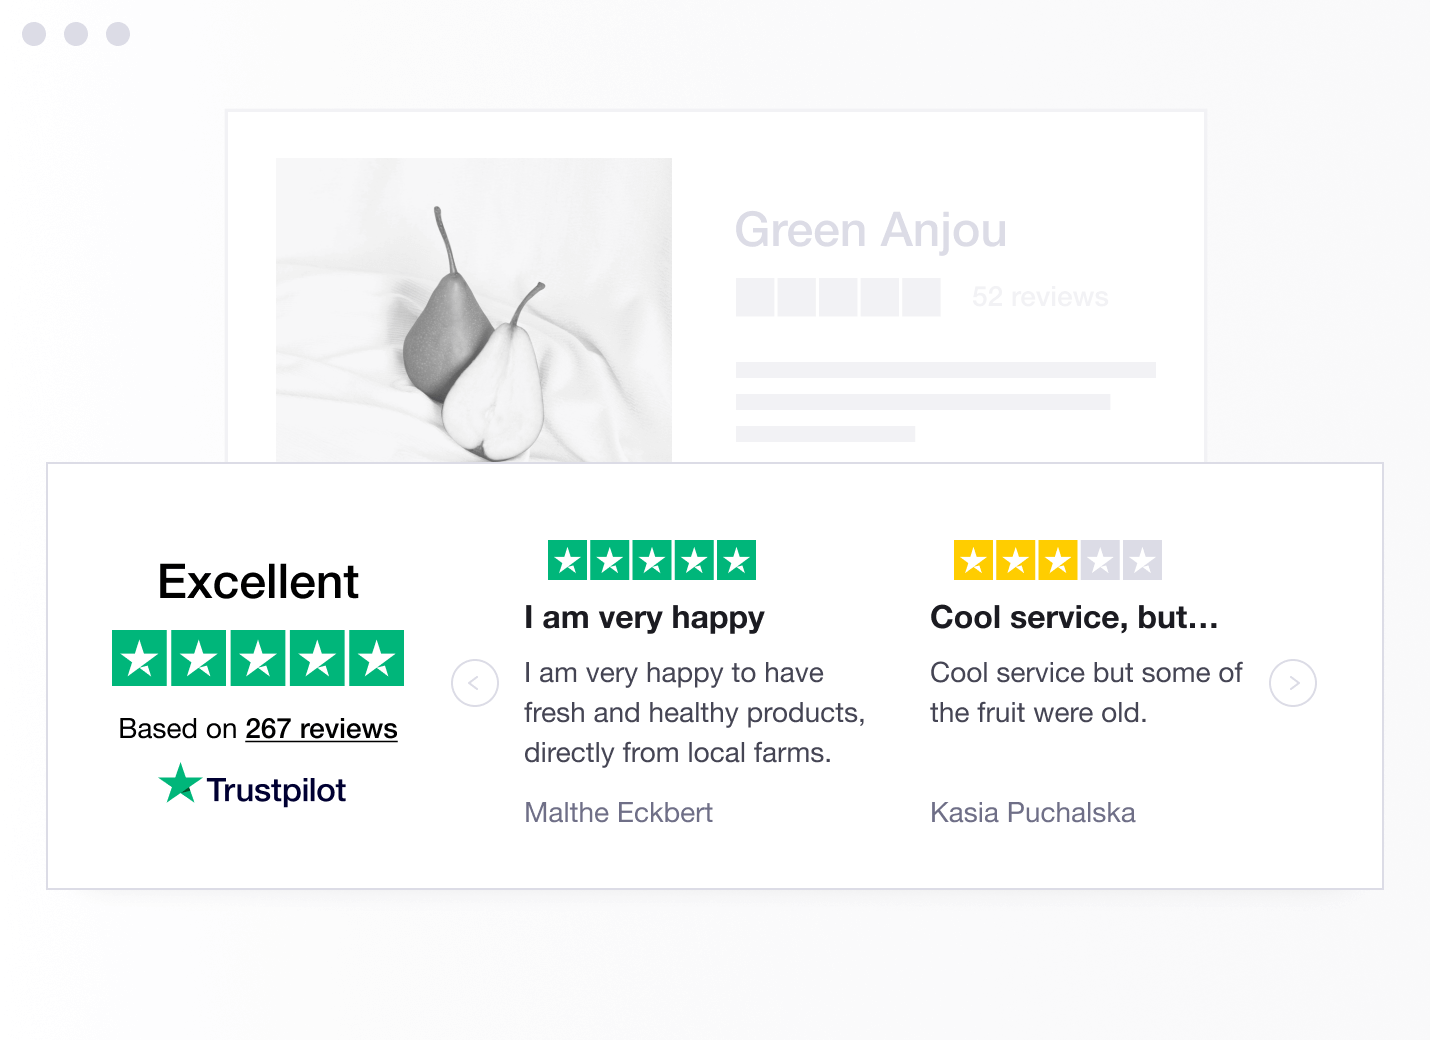 Example Trustpilot review